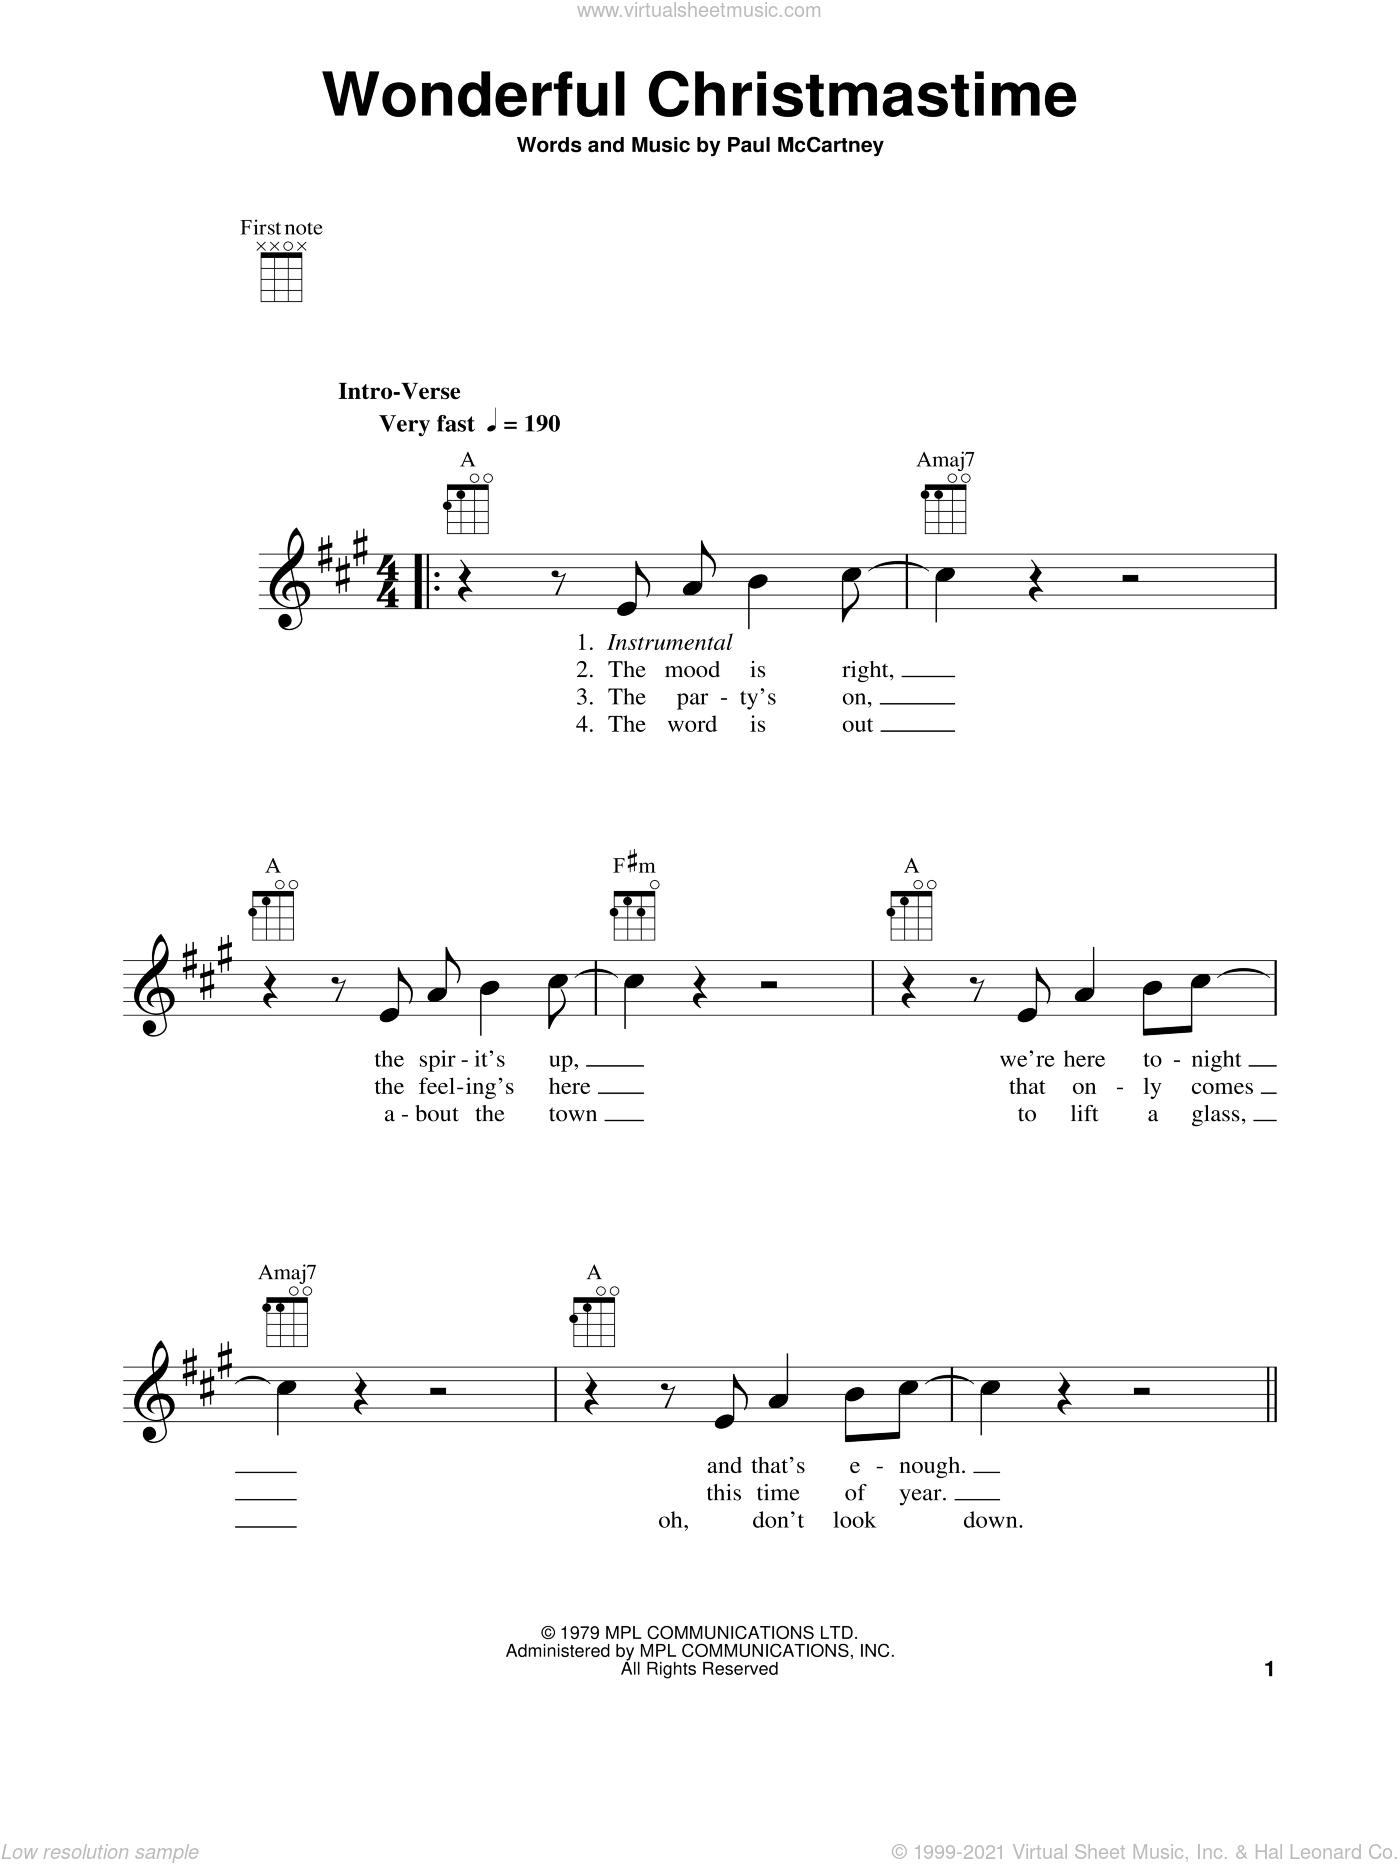 Wonderful Christmastime sheet music for ukulele by Paul McCartney and Straight No Chaser featuring Paul McCartney, intermediate skill level